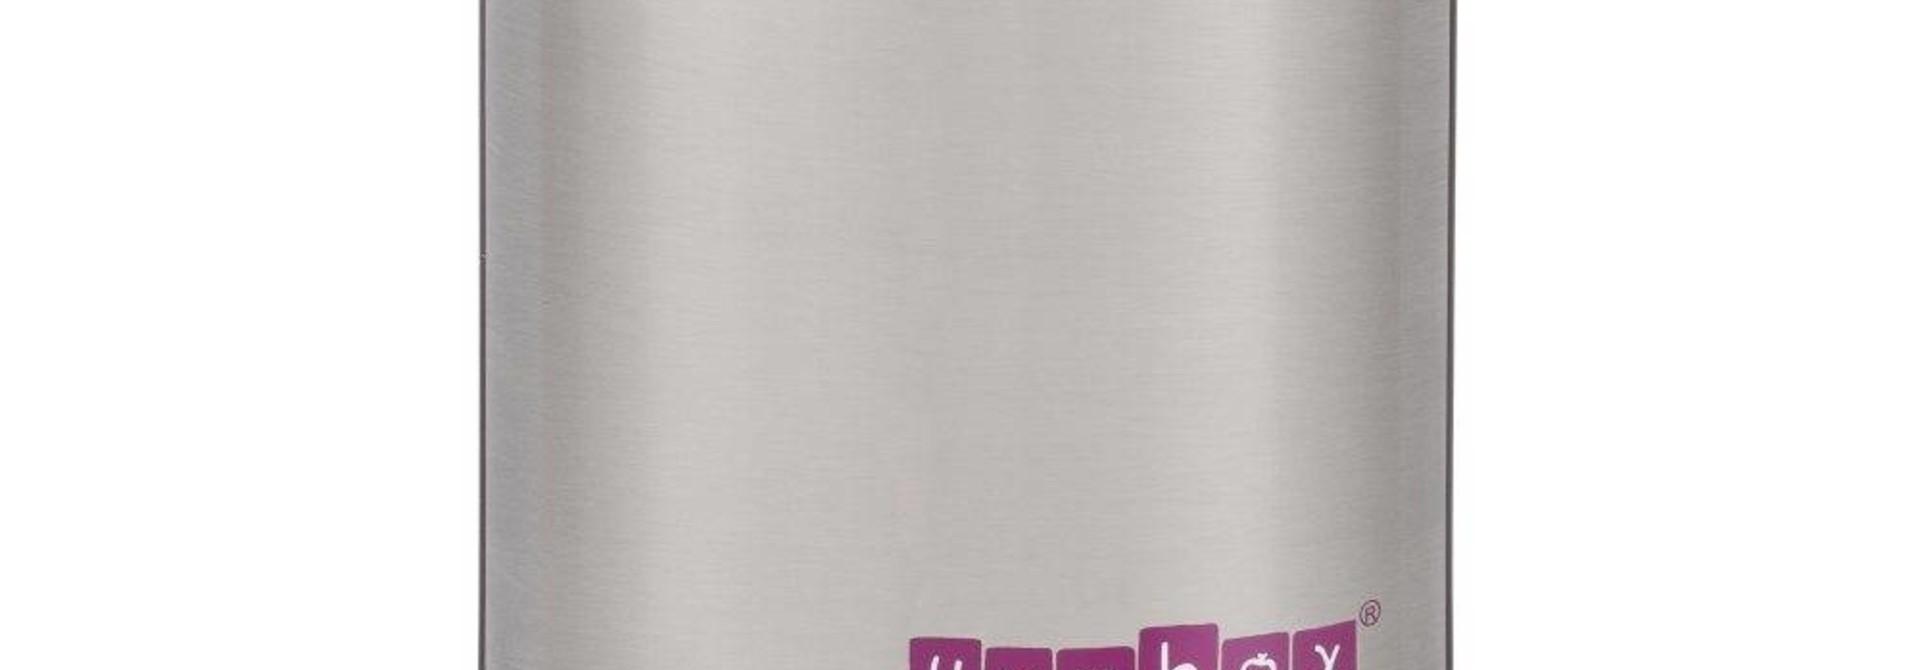 Yumbox Zuppa purple